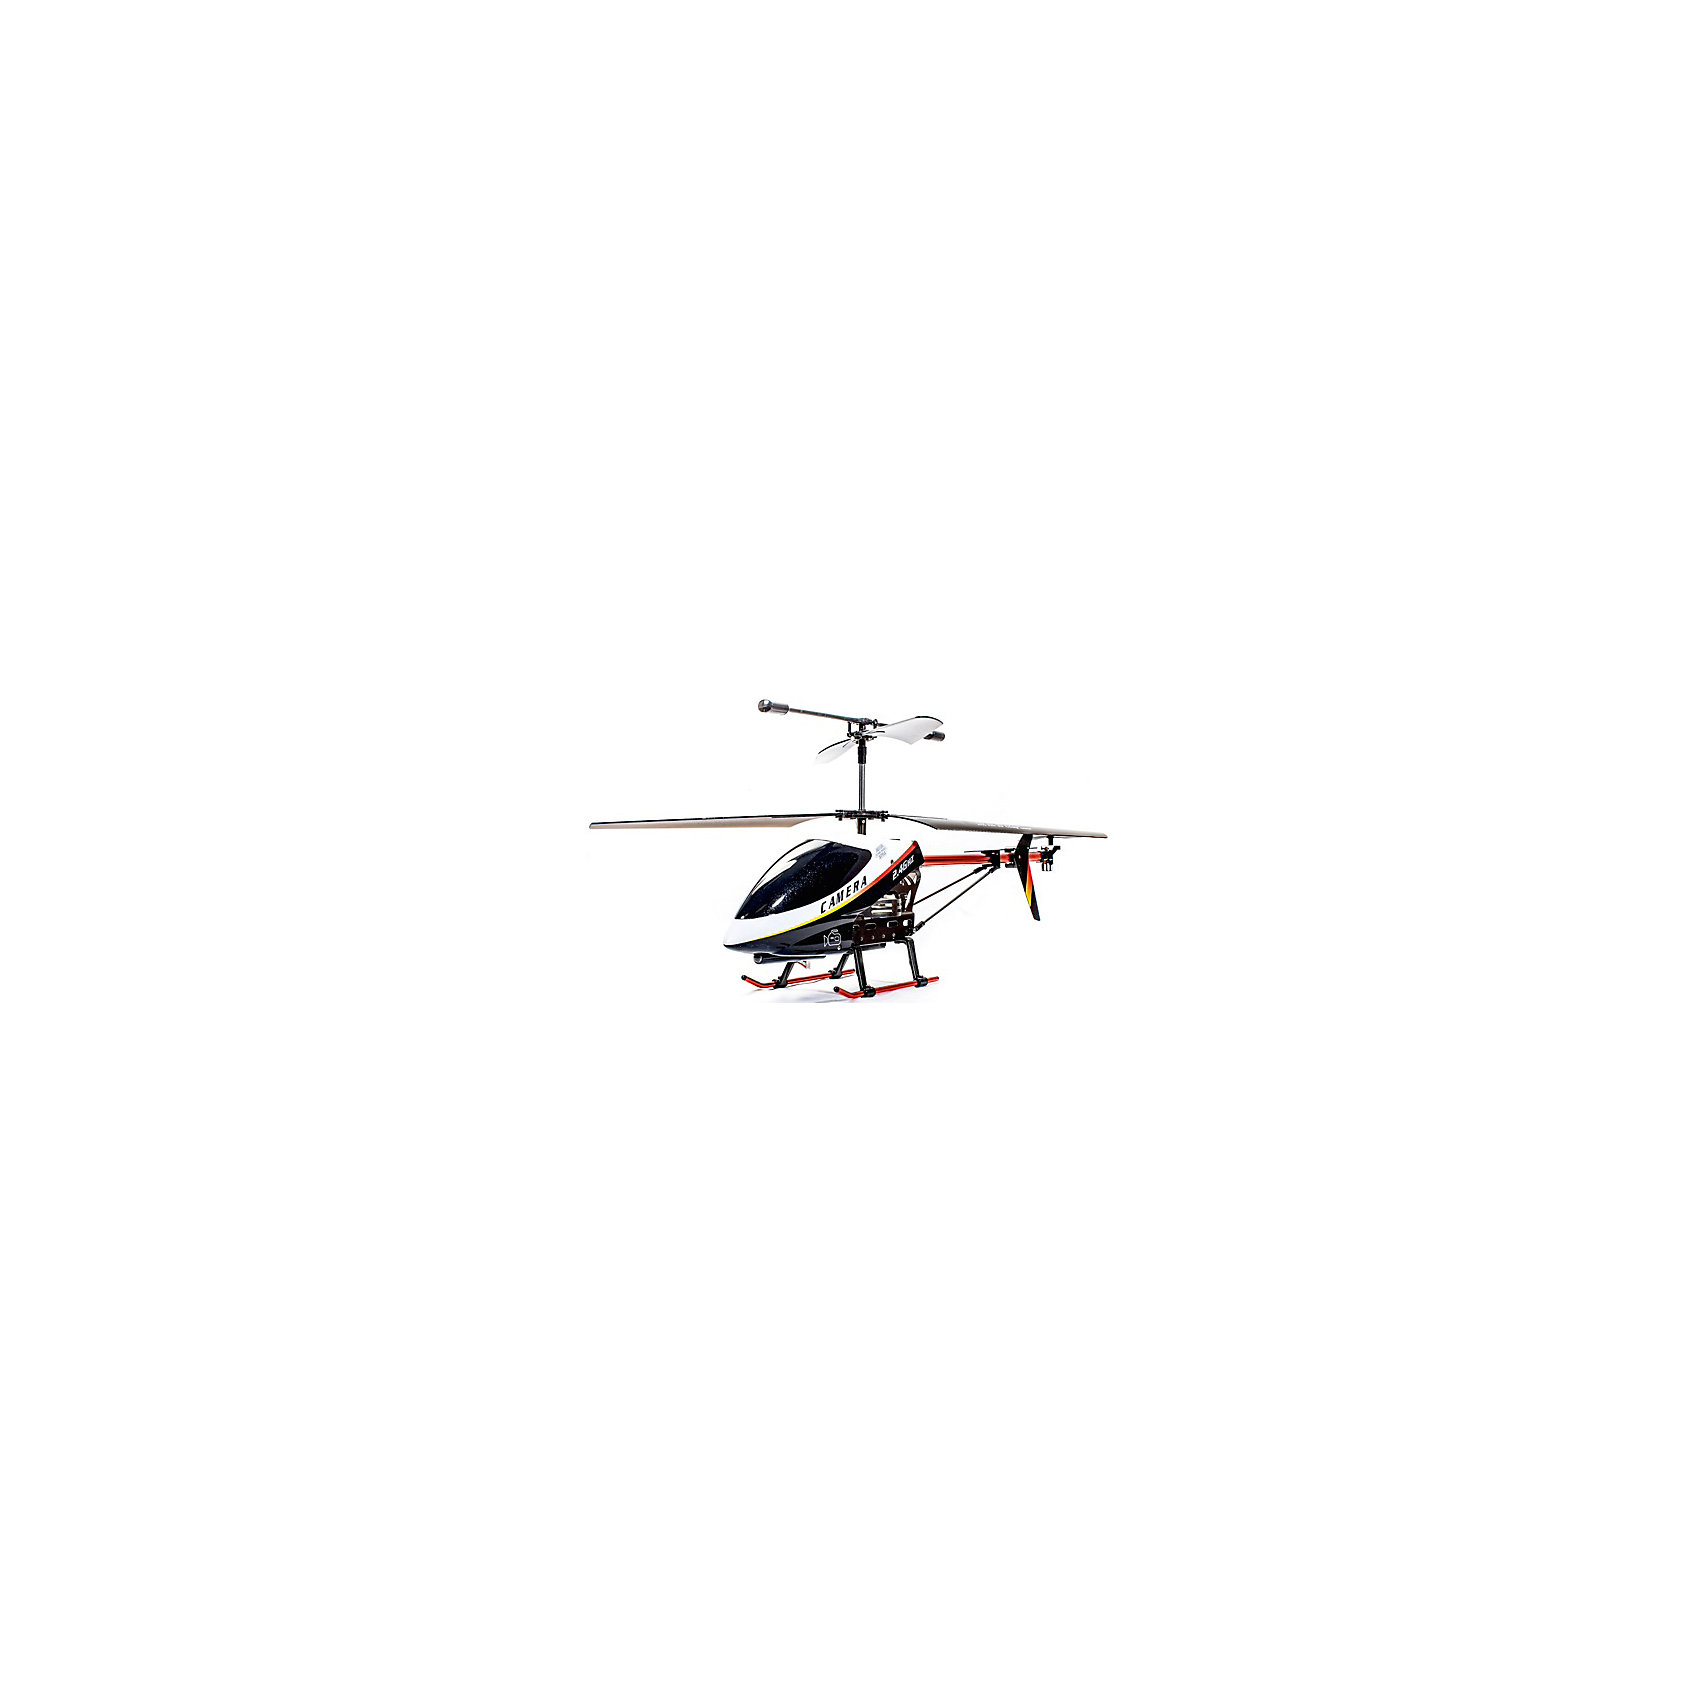 Радиоуправляемый вертолет BIG U12A, UDIRCРадиоуправляемый транспорт<br><br><br>Ширина мм: 835<br>Глубина мм: 425<br>Высота мм: 675<br>Вес г: 1850<br>Возраст от месяцев: 36<br>Возраст до месяцев: 168<br>Пол: Унисекс<br>Возраст: Детский<br>SKU: 6884006